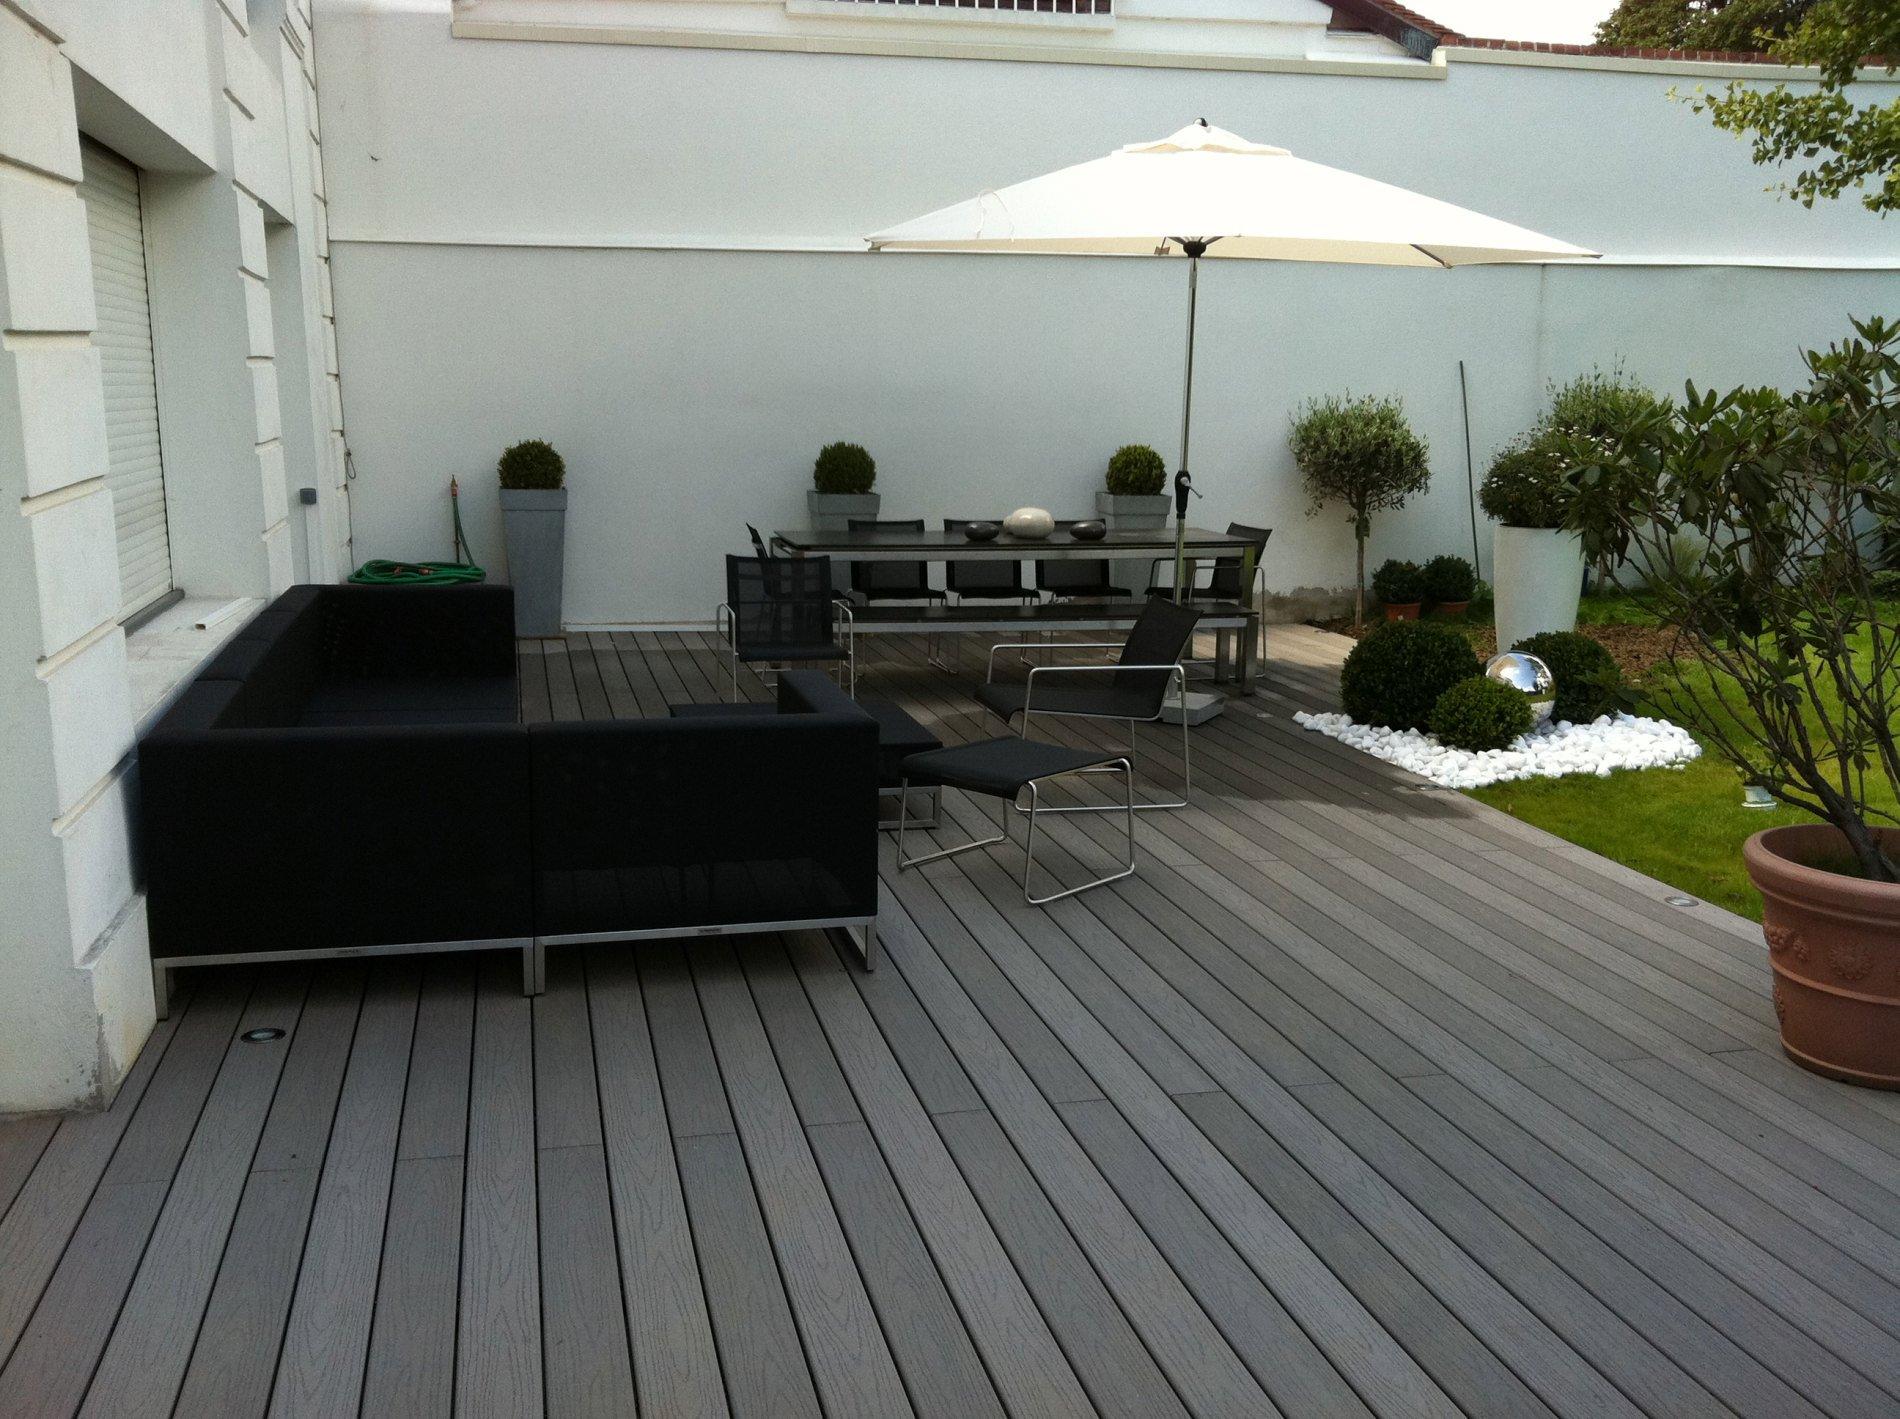 Terrasse bois composite qualite nos conseils - Avis terrasse composite ...